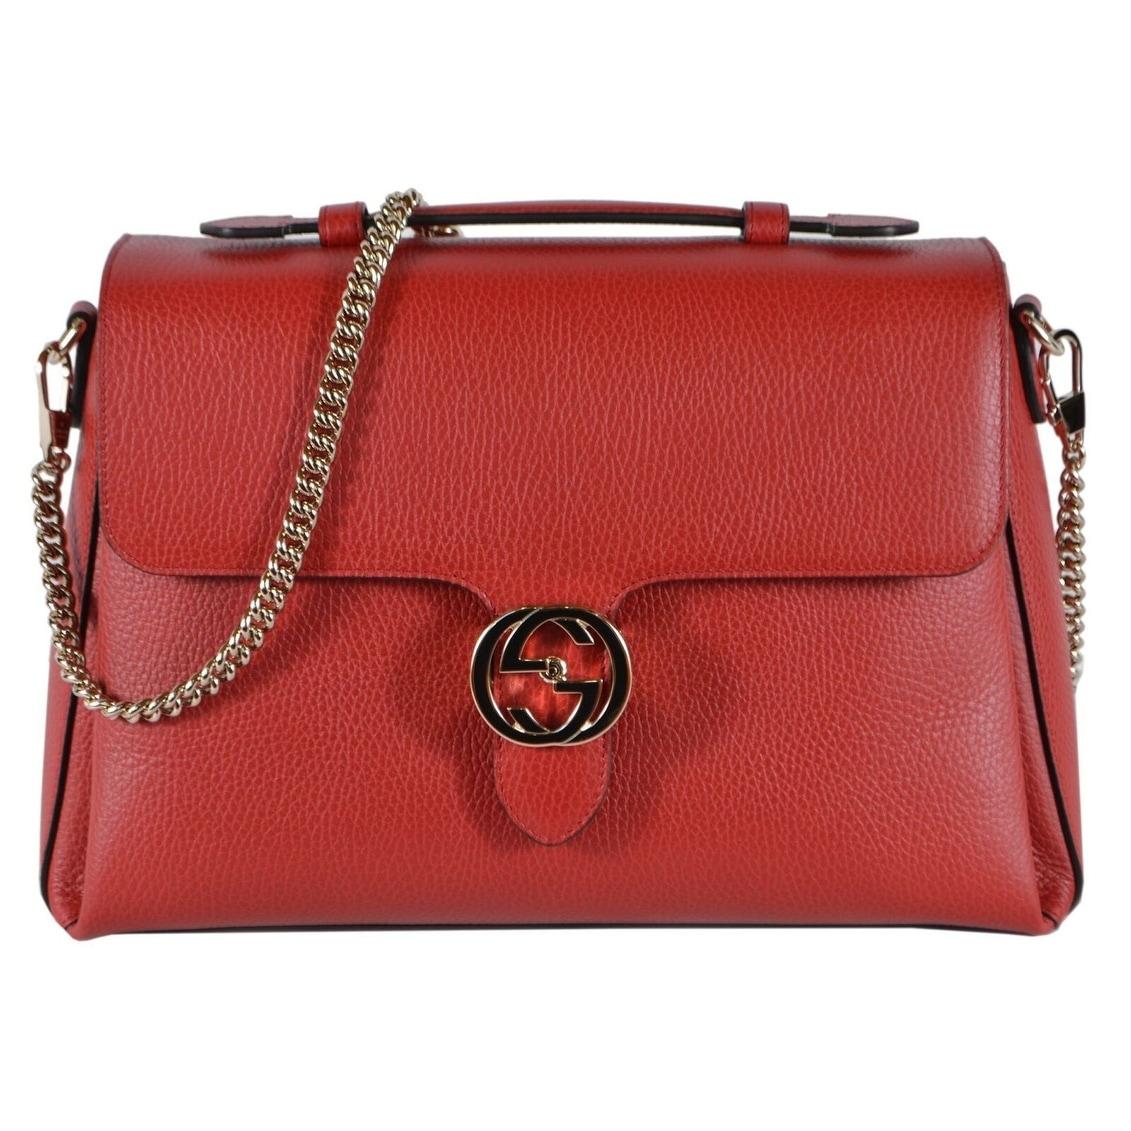 Gucci Women\u0027s Red Leather 510306 Large Interlocking GG Purse Shoulder Bag